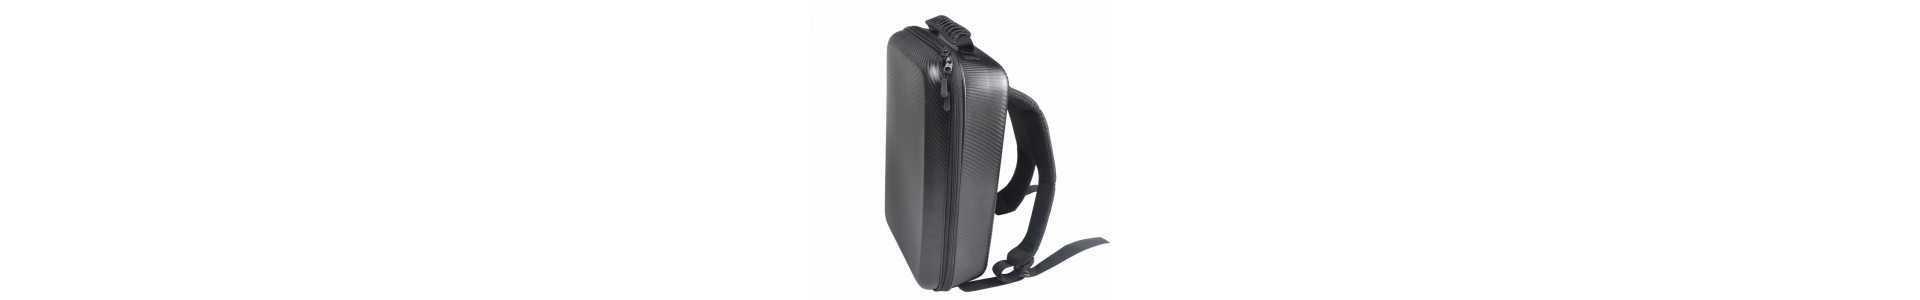 Borse, zaini, valigie per Droni, Hand Bag, Backpack, Shoulder Bag